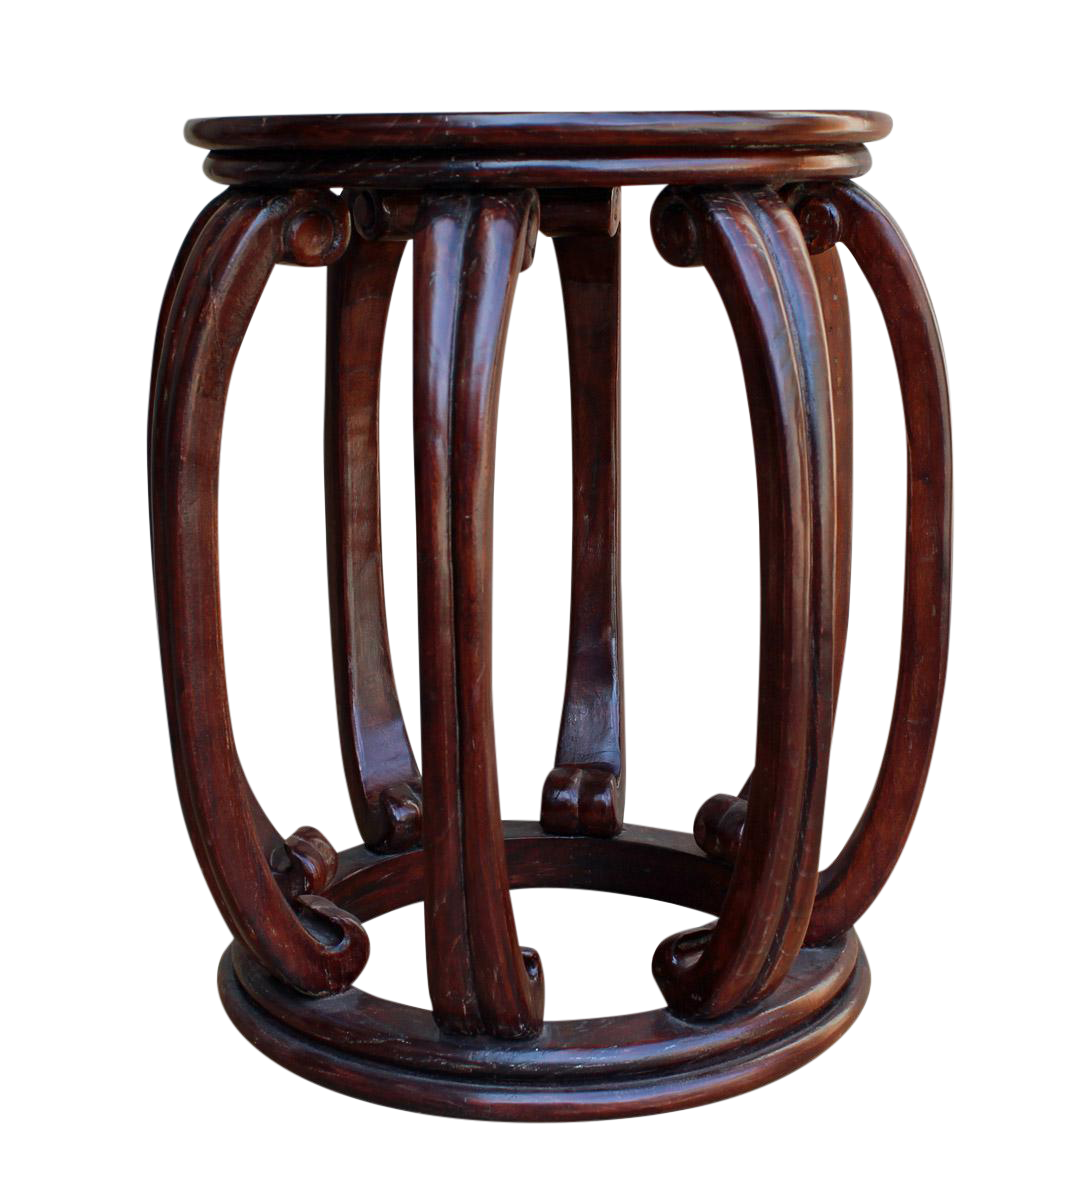 Chinese Oriental Brown Wood Barrel Stool